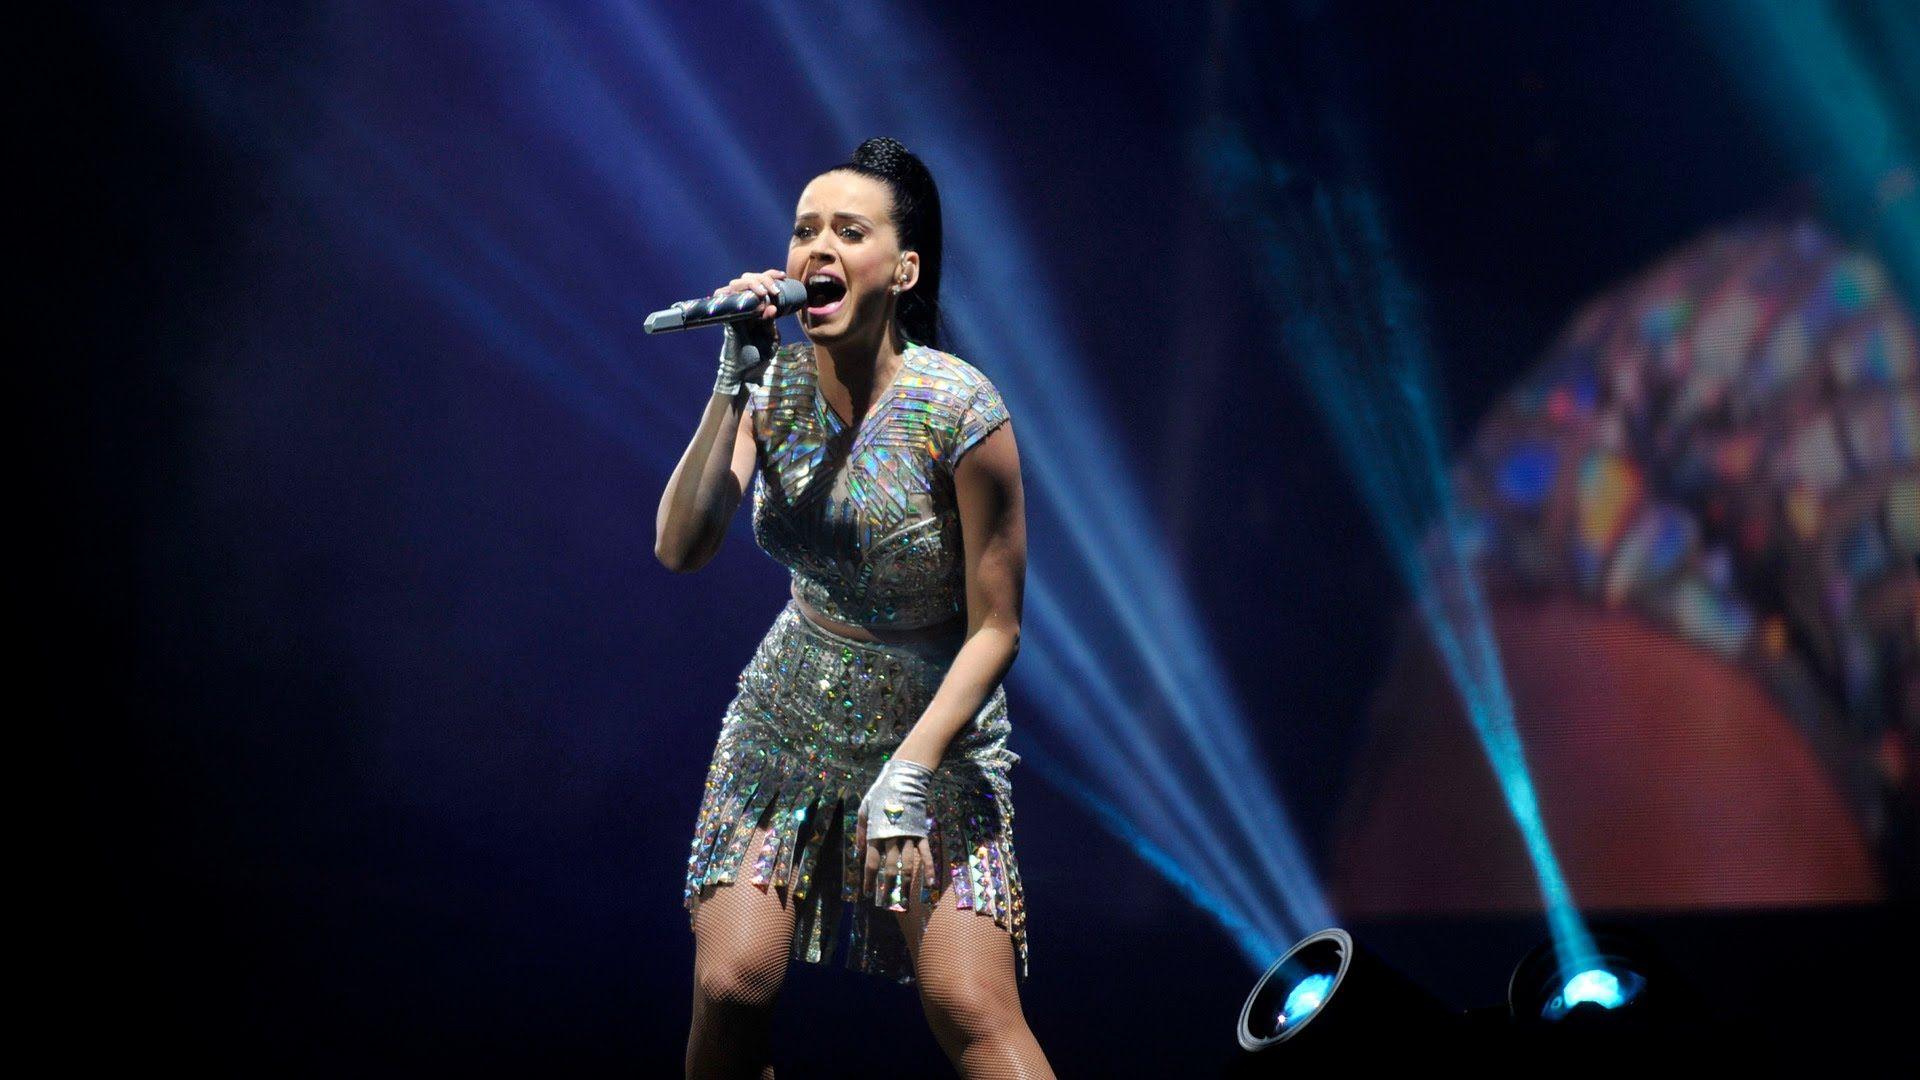 Katy Perry - Dark Horse (Radio 1's Big Weekend 2014)